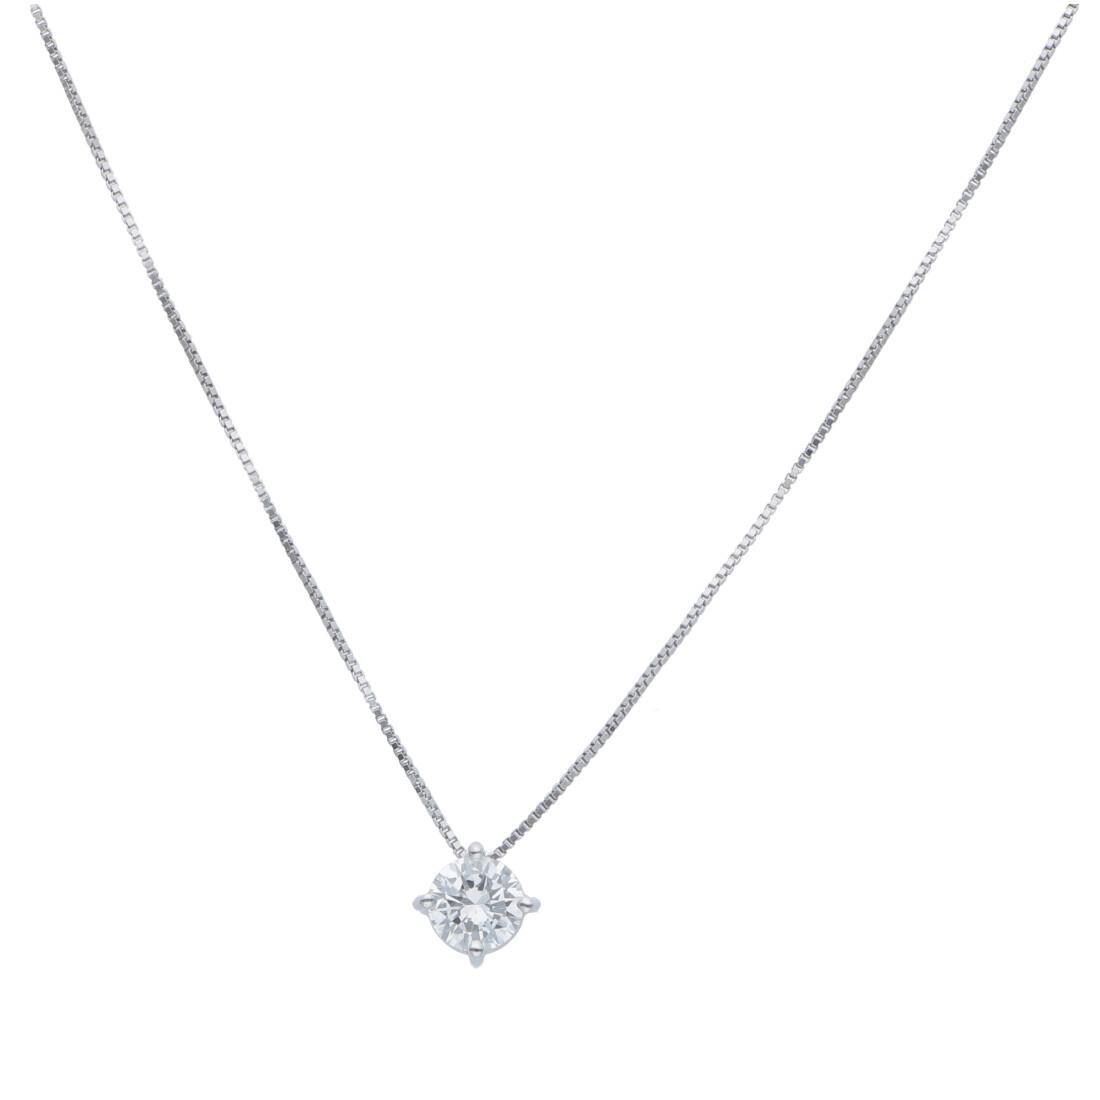 Collana punto luce con diamanti ct 0,31 - ALFIERI & ST. JOHN